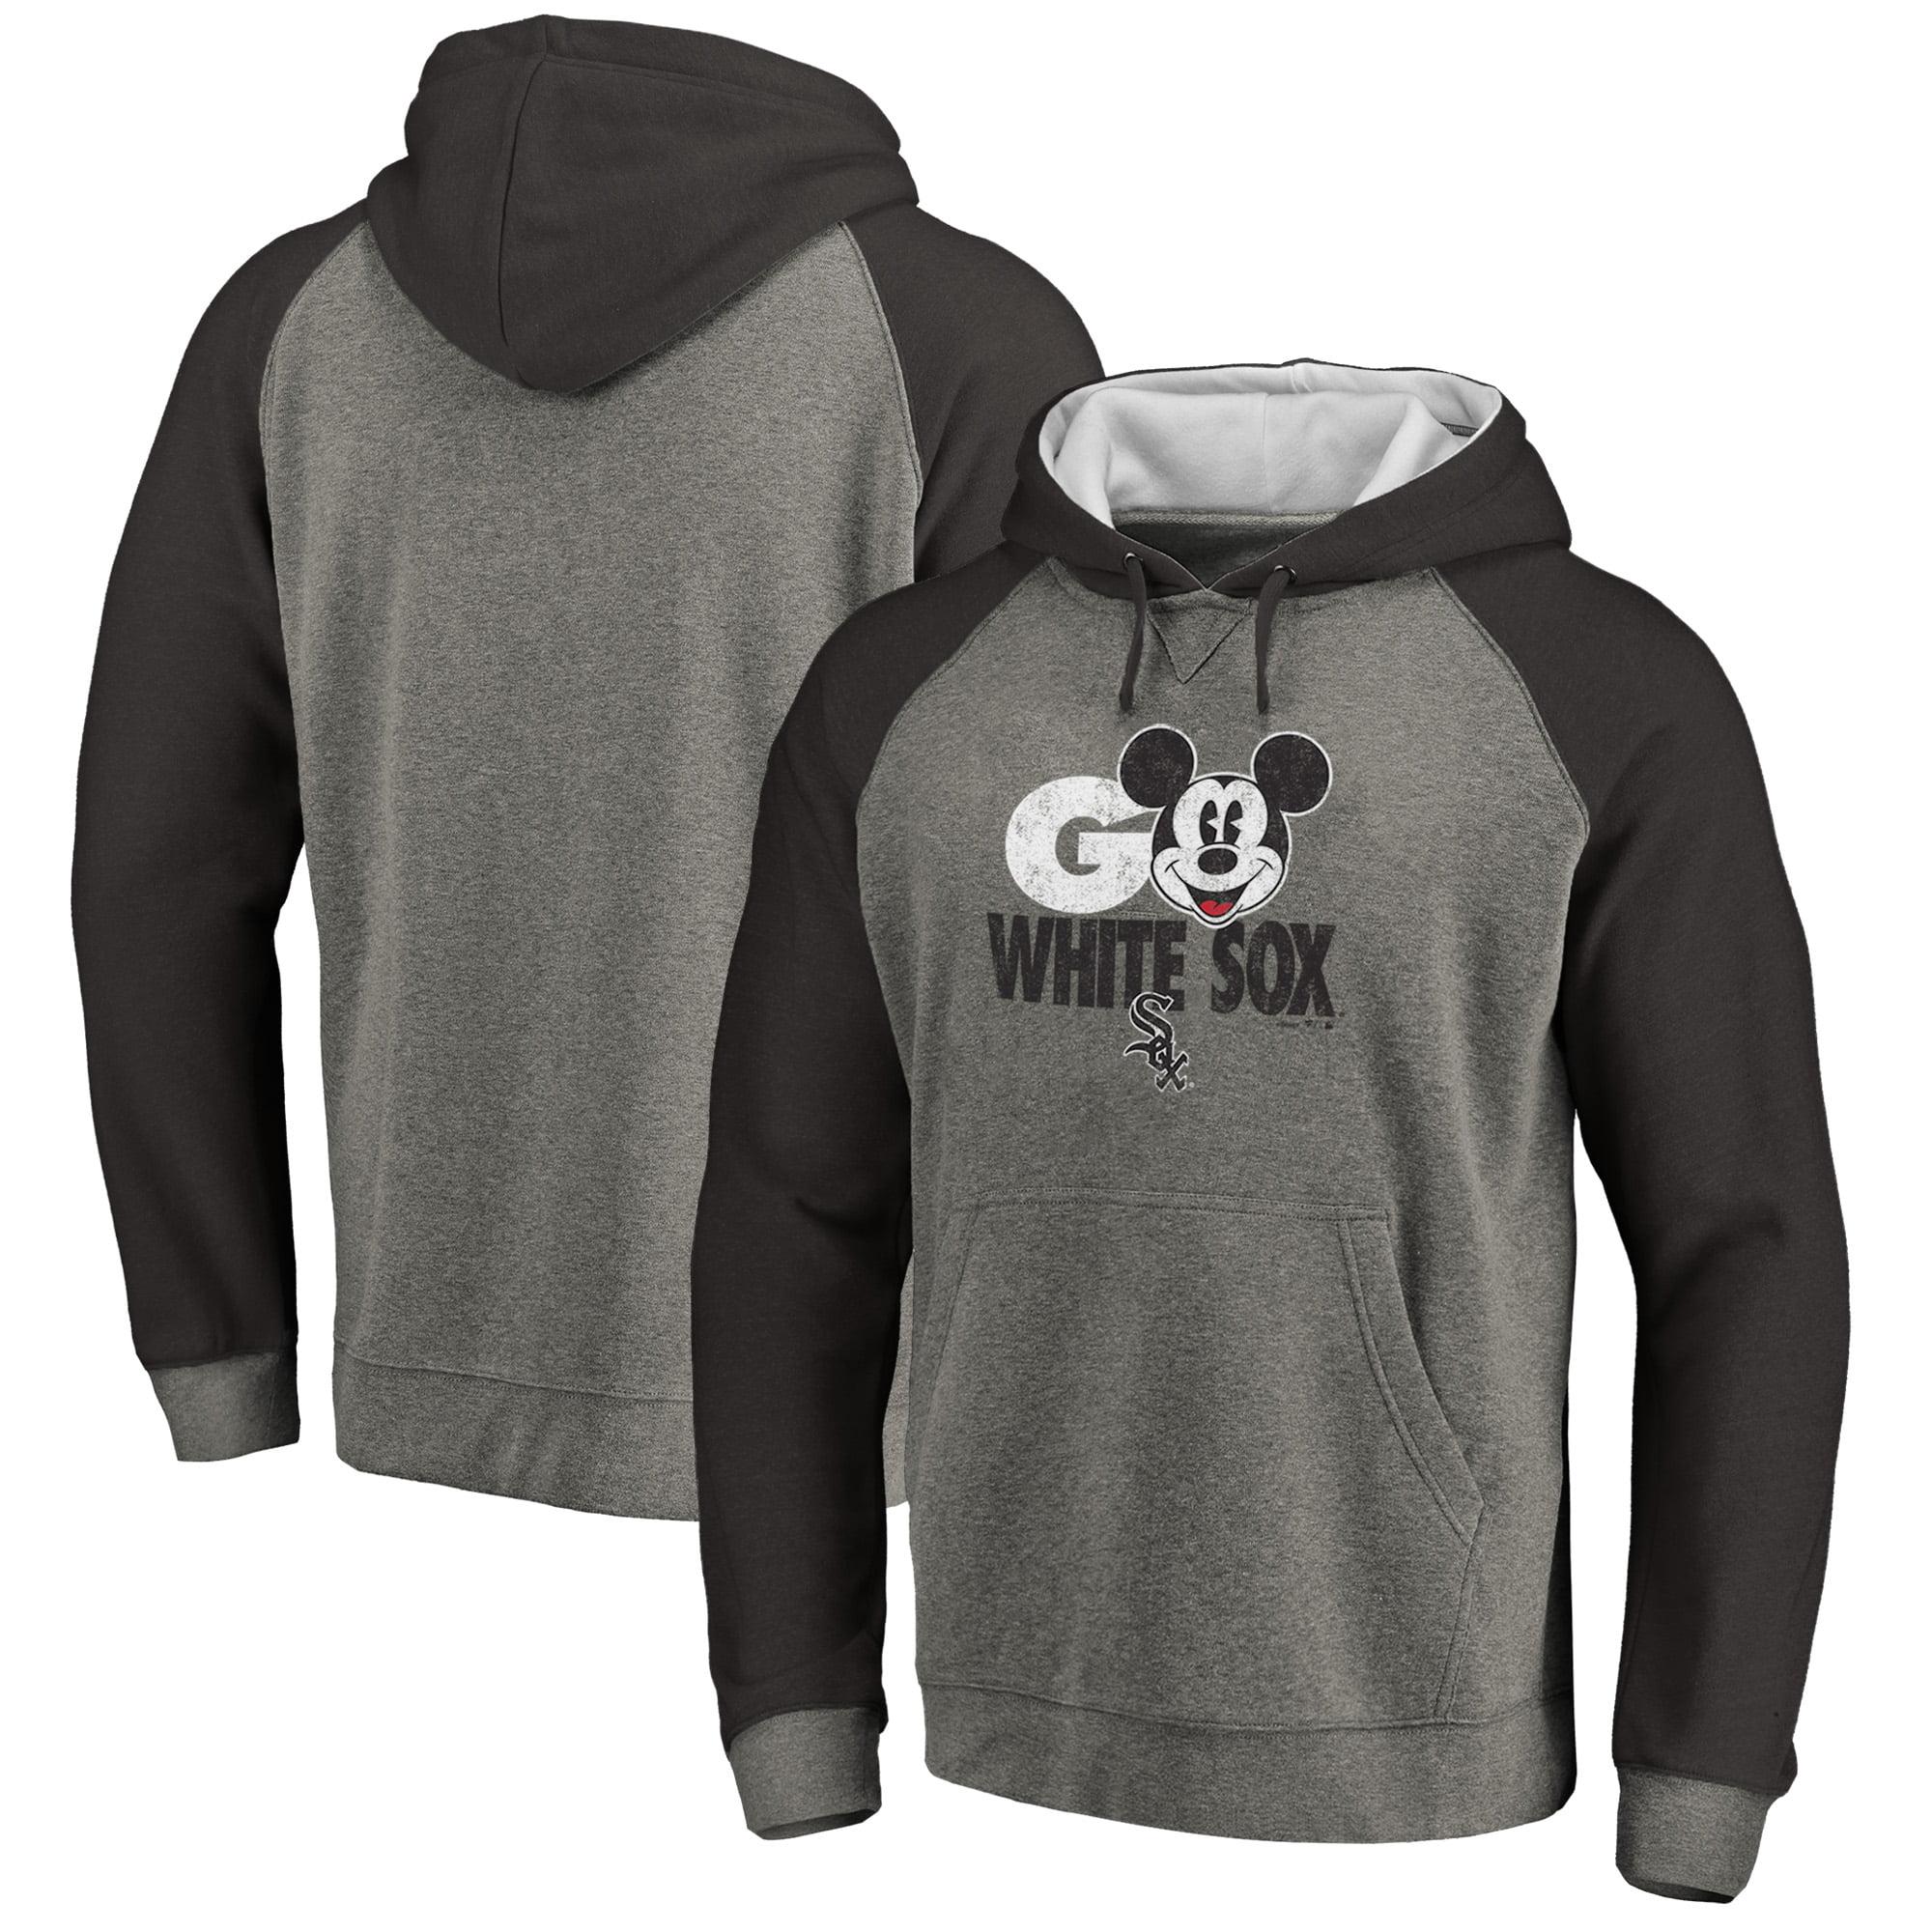 Chicago White Sox Fanatics Branded Disney Rally Cry Tri-Blend Raglan Pullover Hoodie - Ash